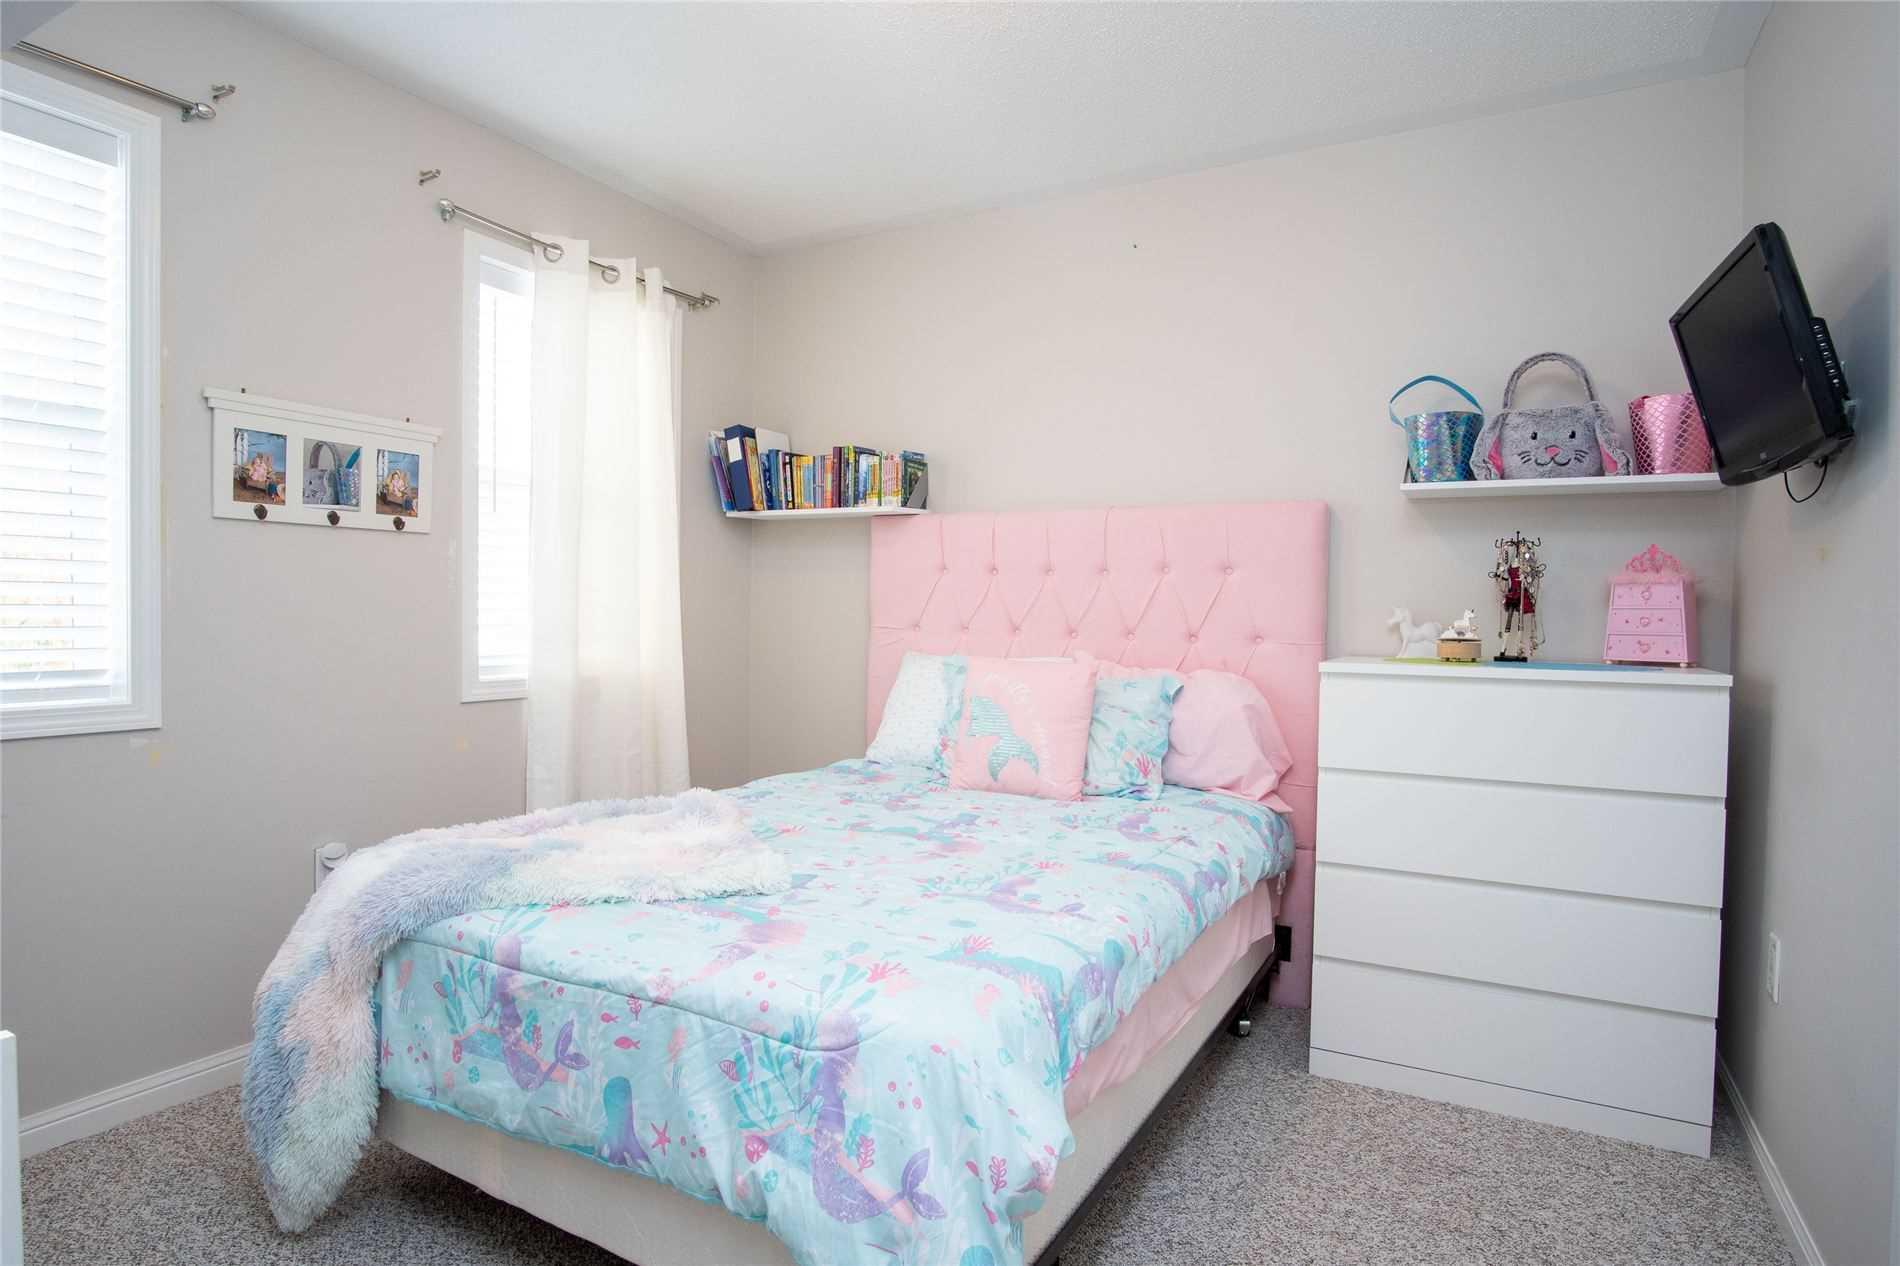 827 Biggar Hts - Coates Detached for sale, 4 Bedrooms (W5400280) - #18